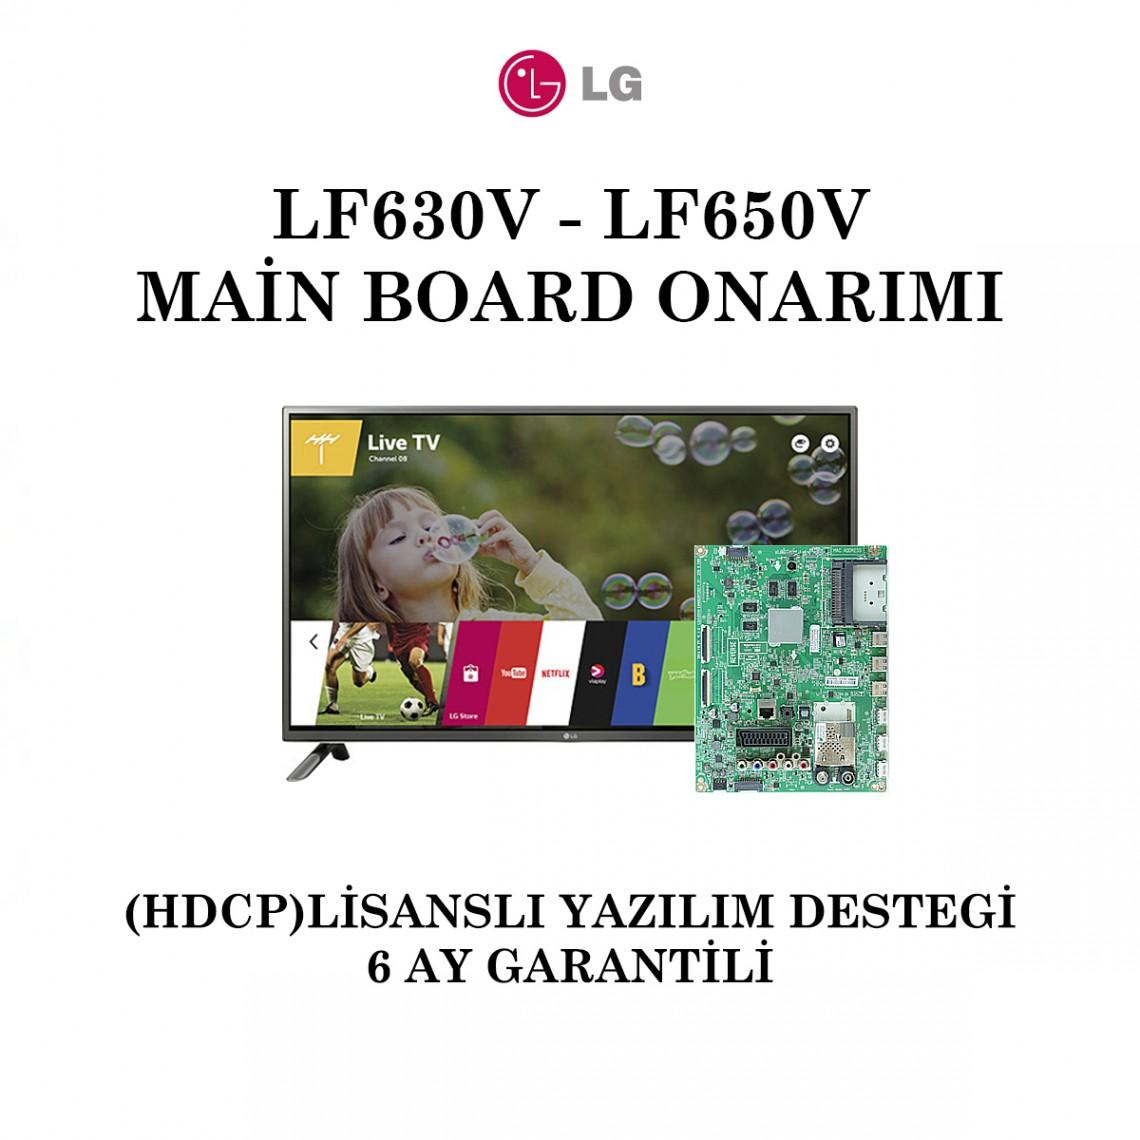 LG, LD / LE51H, EAX66207203(1.0), EAX66207202(1.2), 32LF630V, 32LF650V, 42LF650V, 50LF650V, 55LF650V, Main Board Onarımı